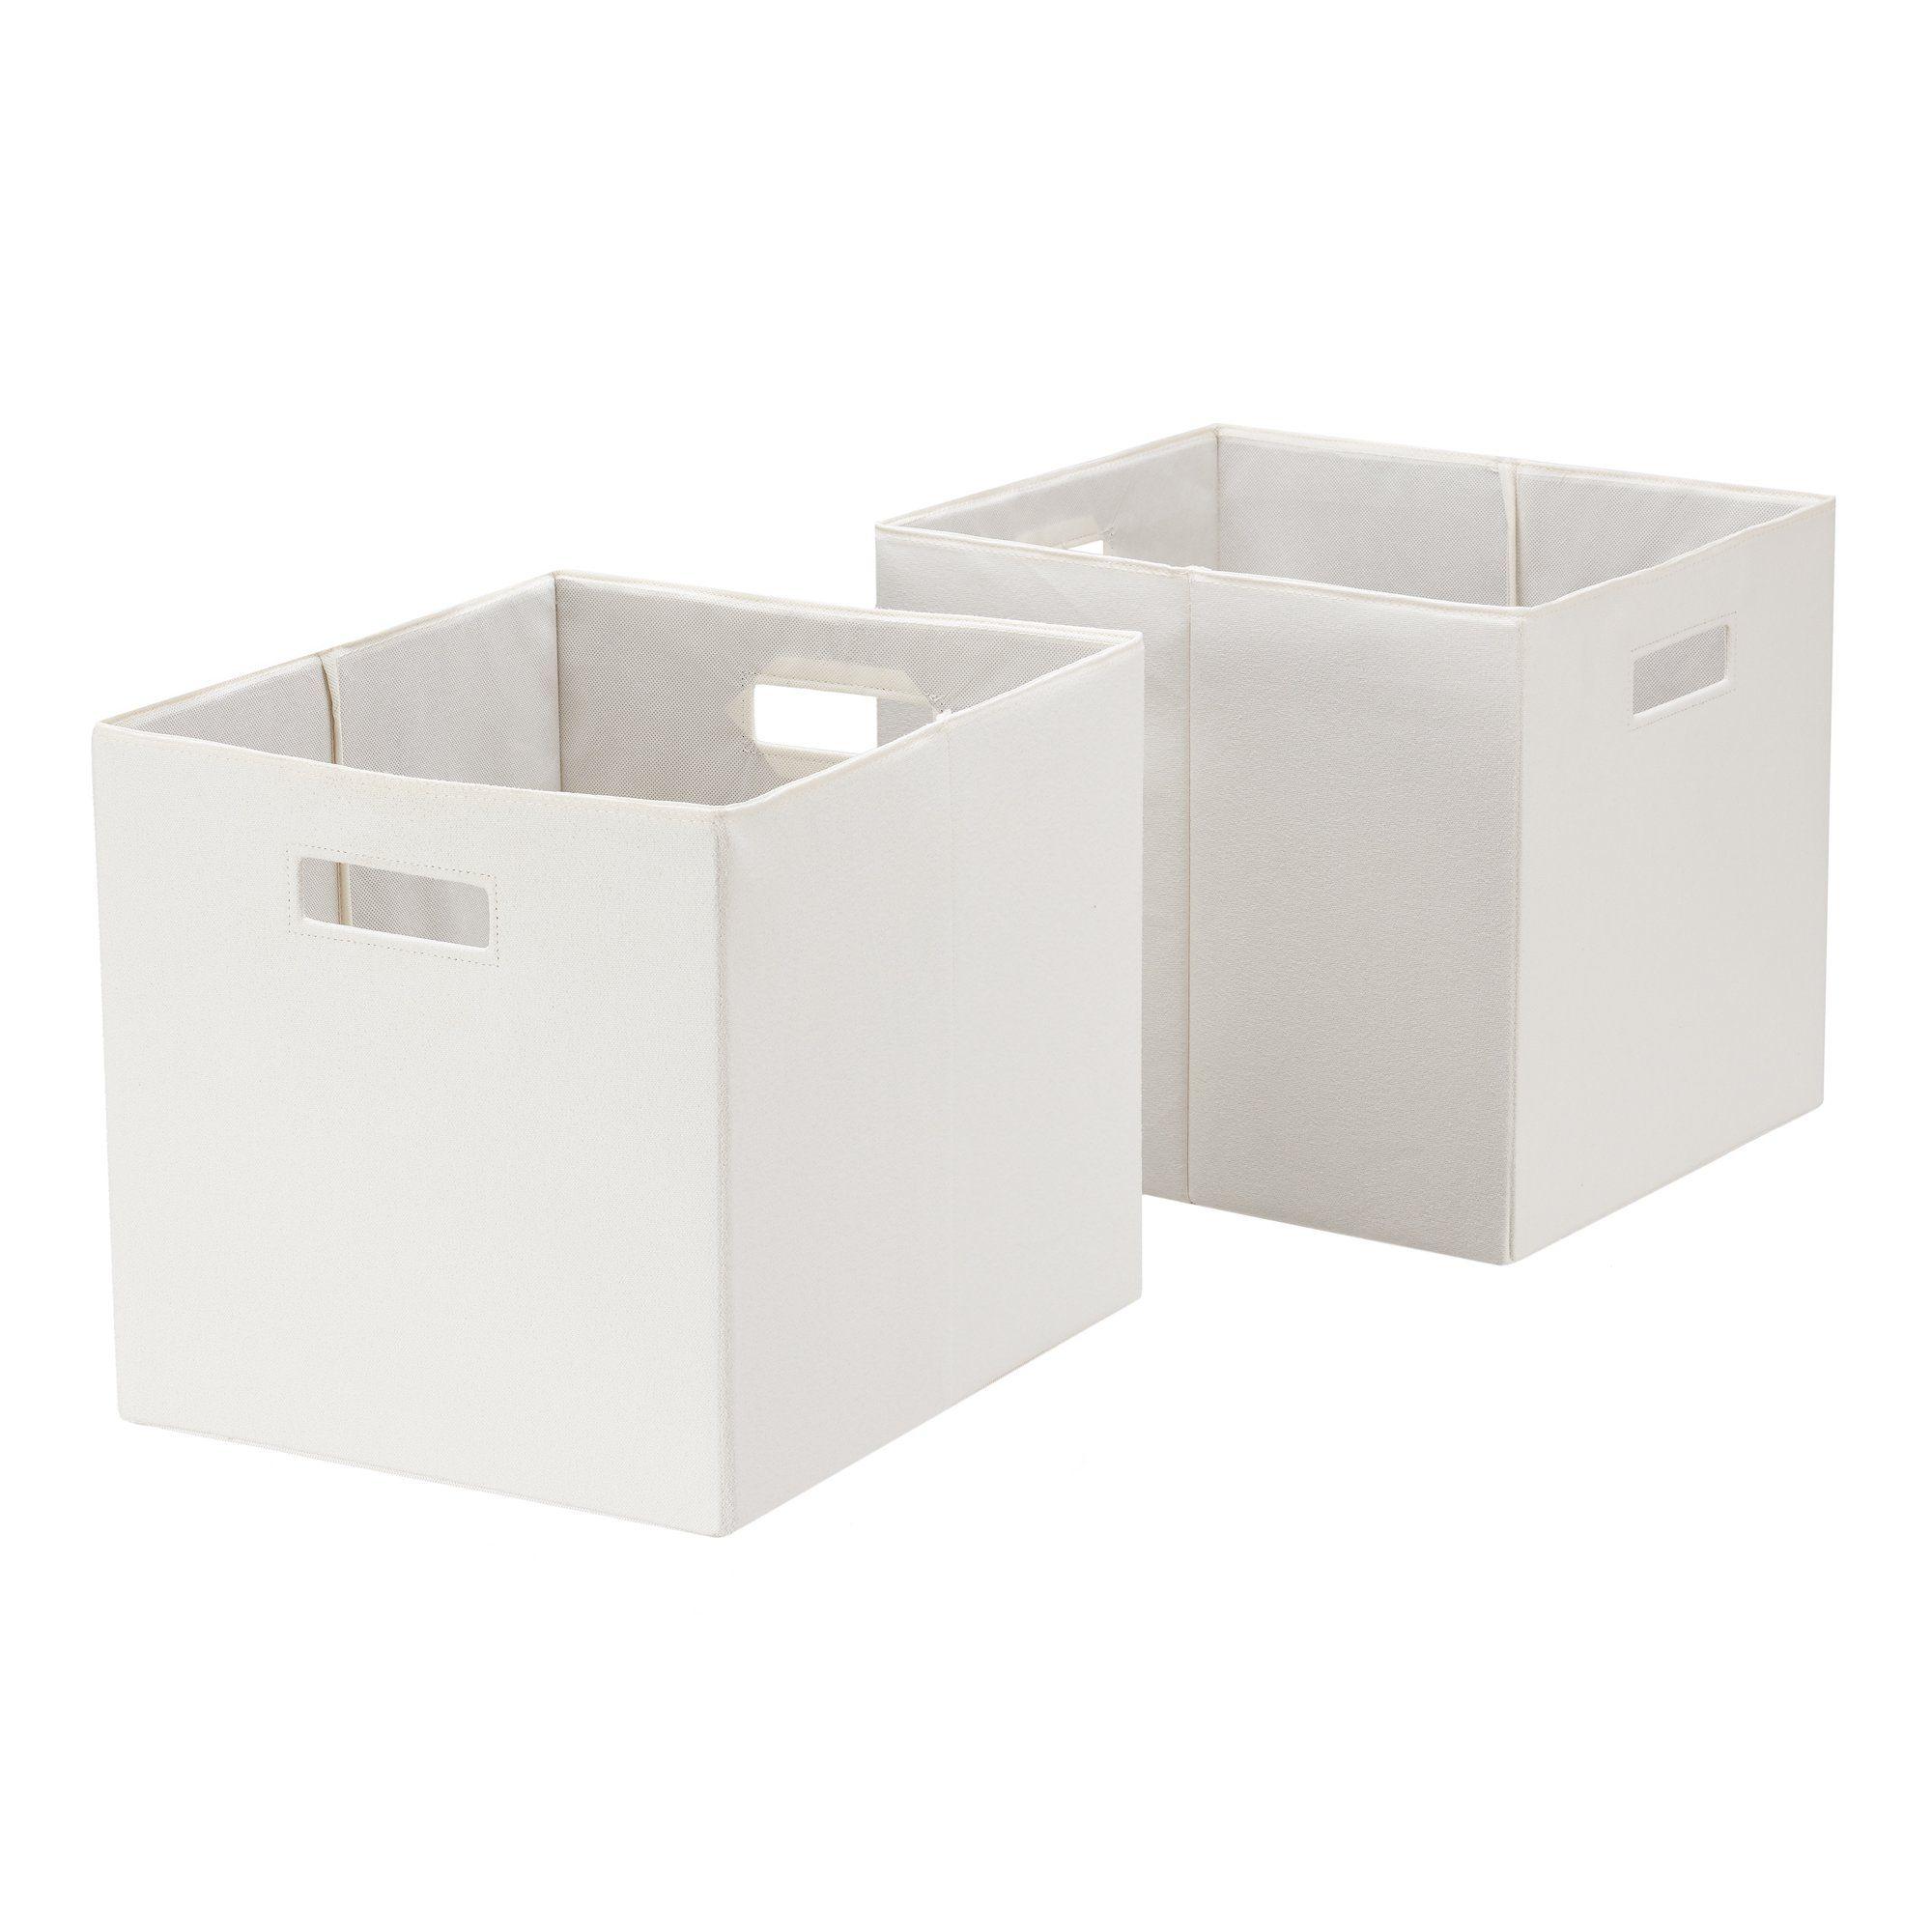 Better Homes Gardens Fabric Cube Storage Bins 12 75 X 12 75 Set Of 2 Vanilla Dream Walmart Com In 2020 Cube Storage Storage Bins Cube Storage Bins